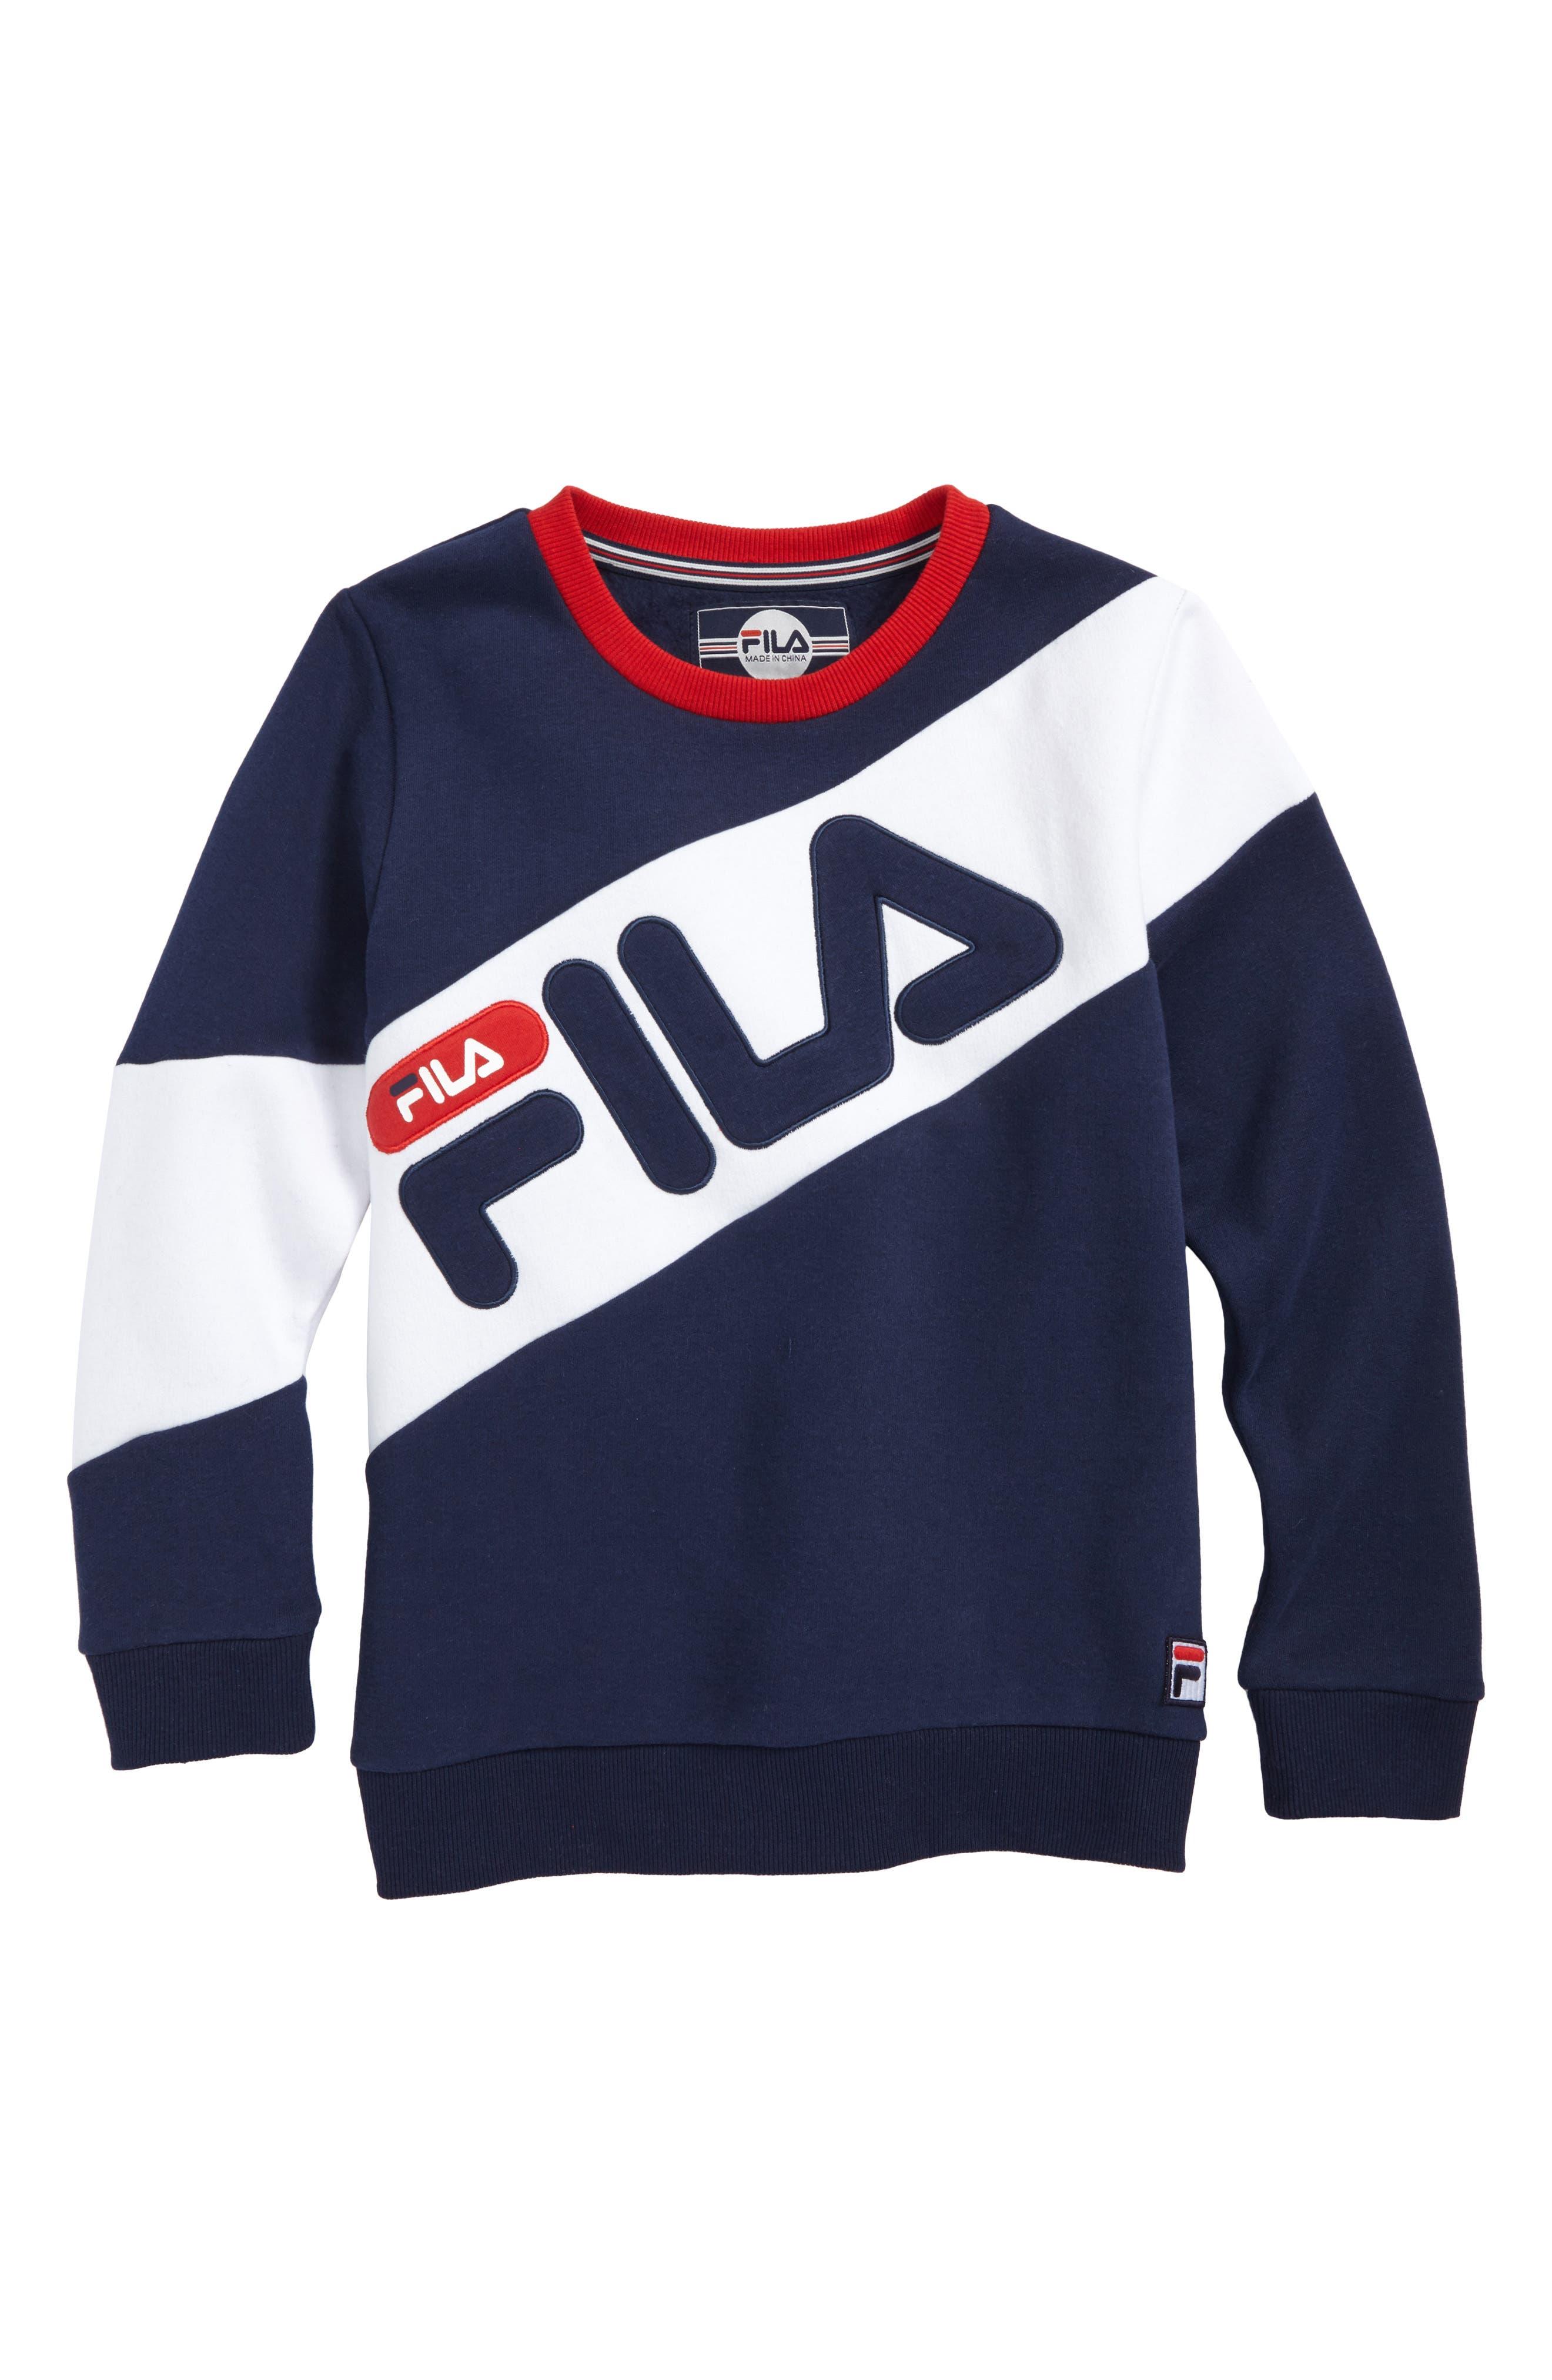 Alternate Image 1 Selected - FILA Colorblock Logo Sweatshirt (Big Boys)